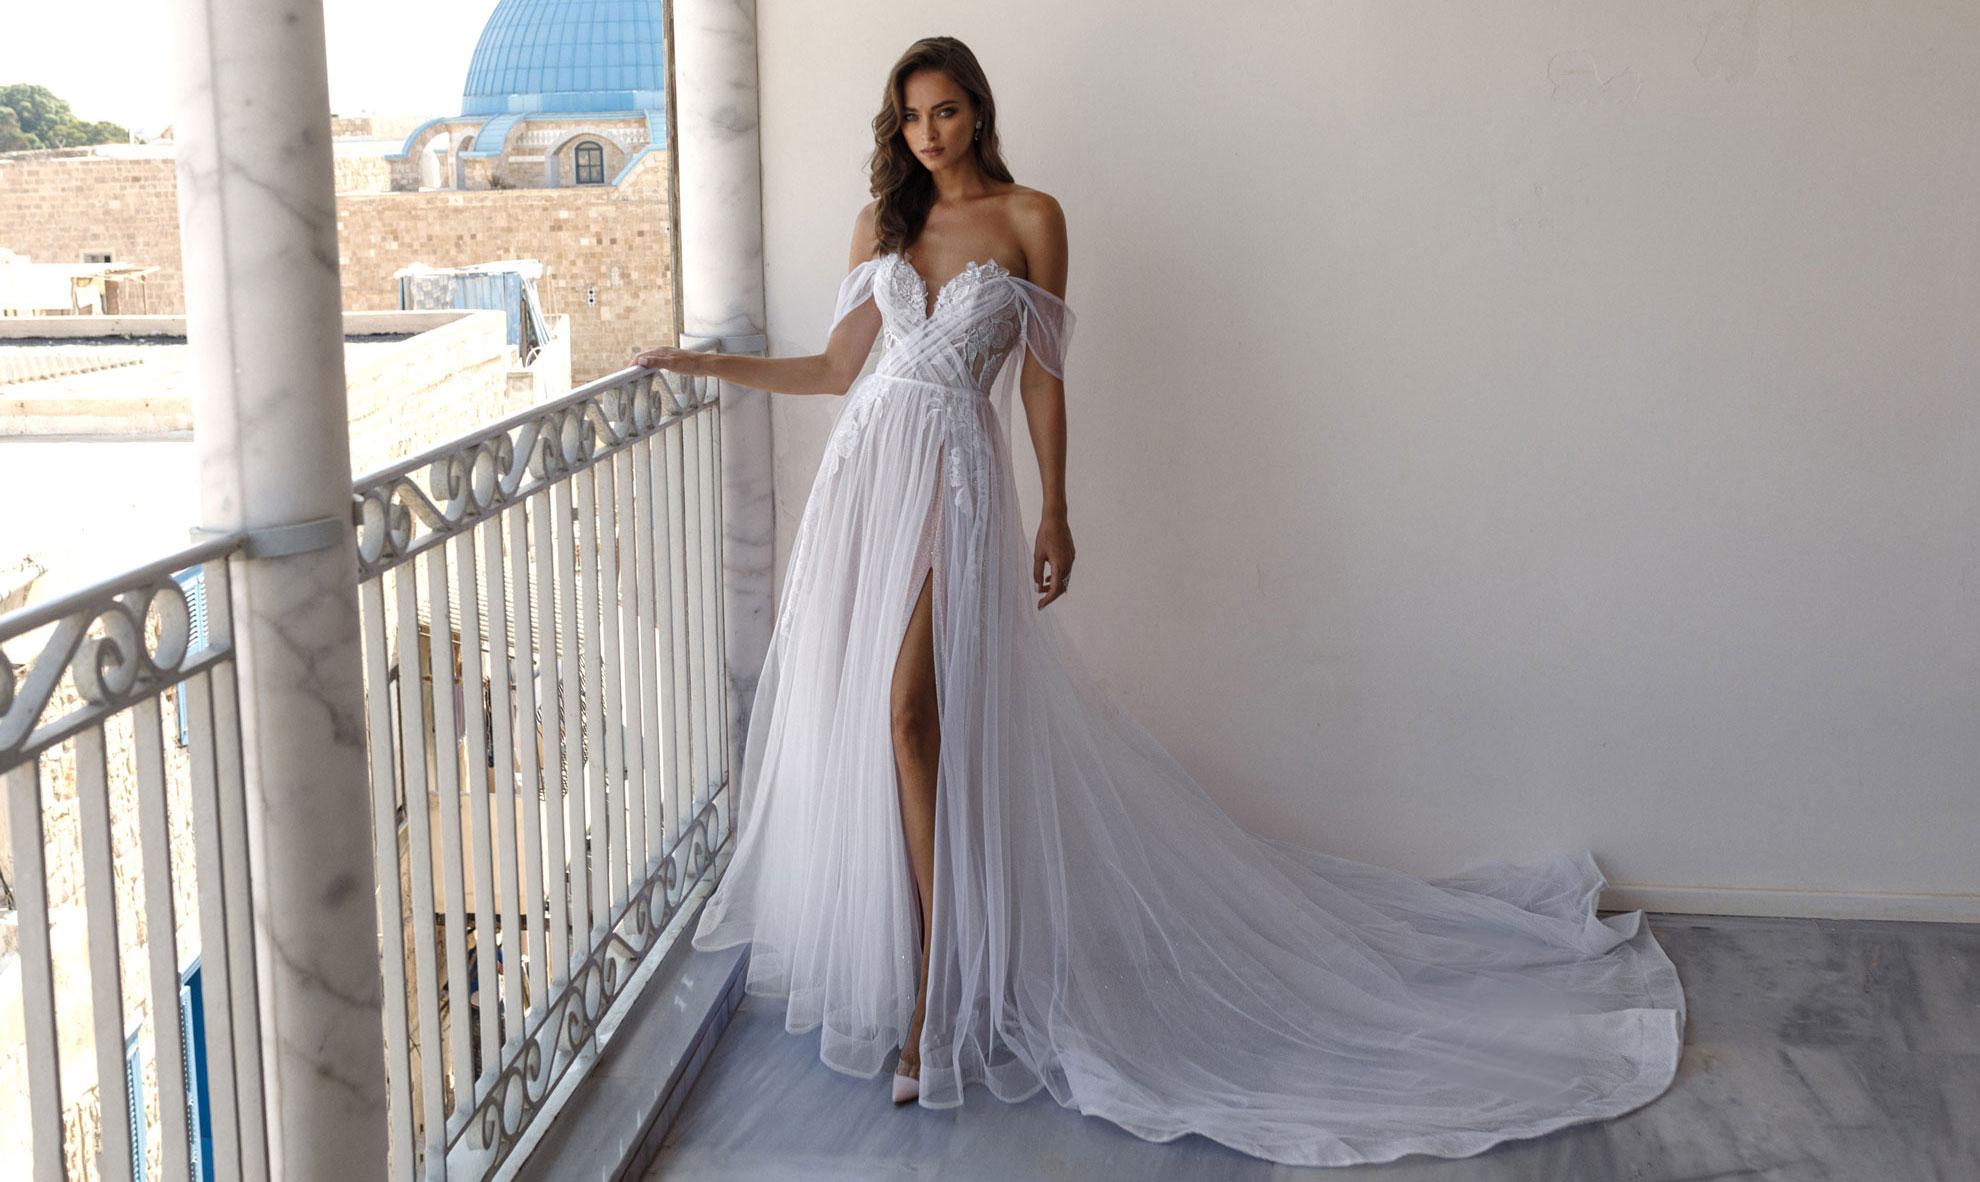 Tali-and-Marianna-Faye-gown-slide-v2